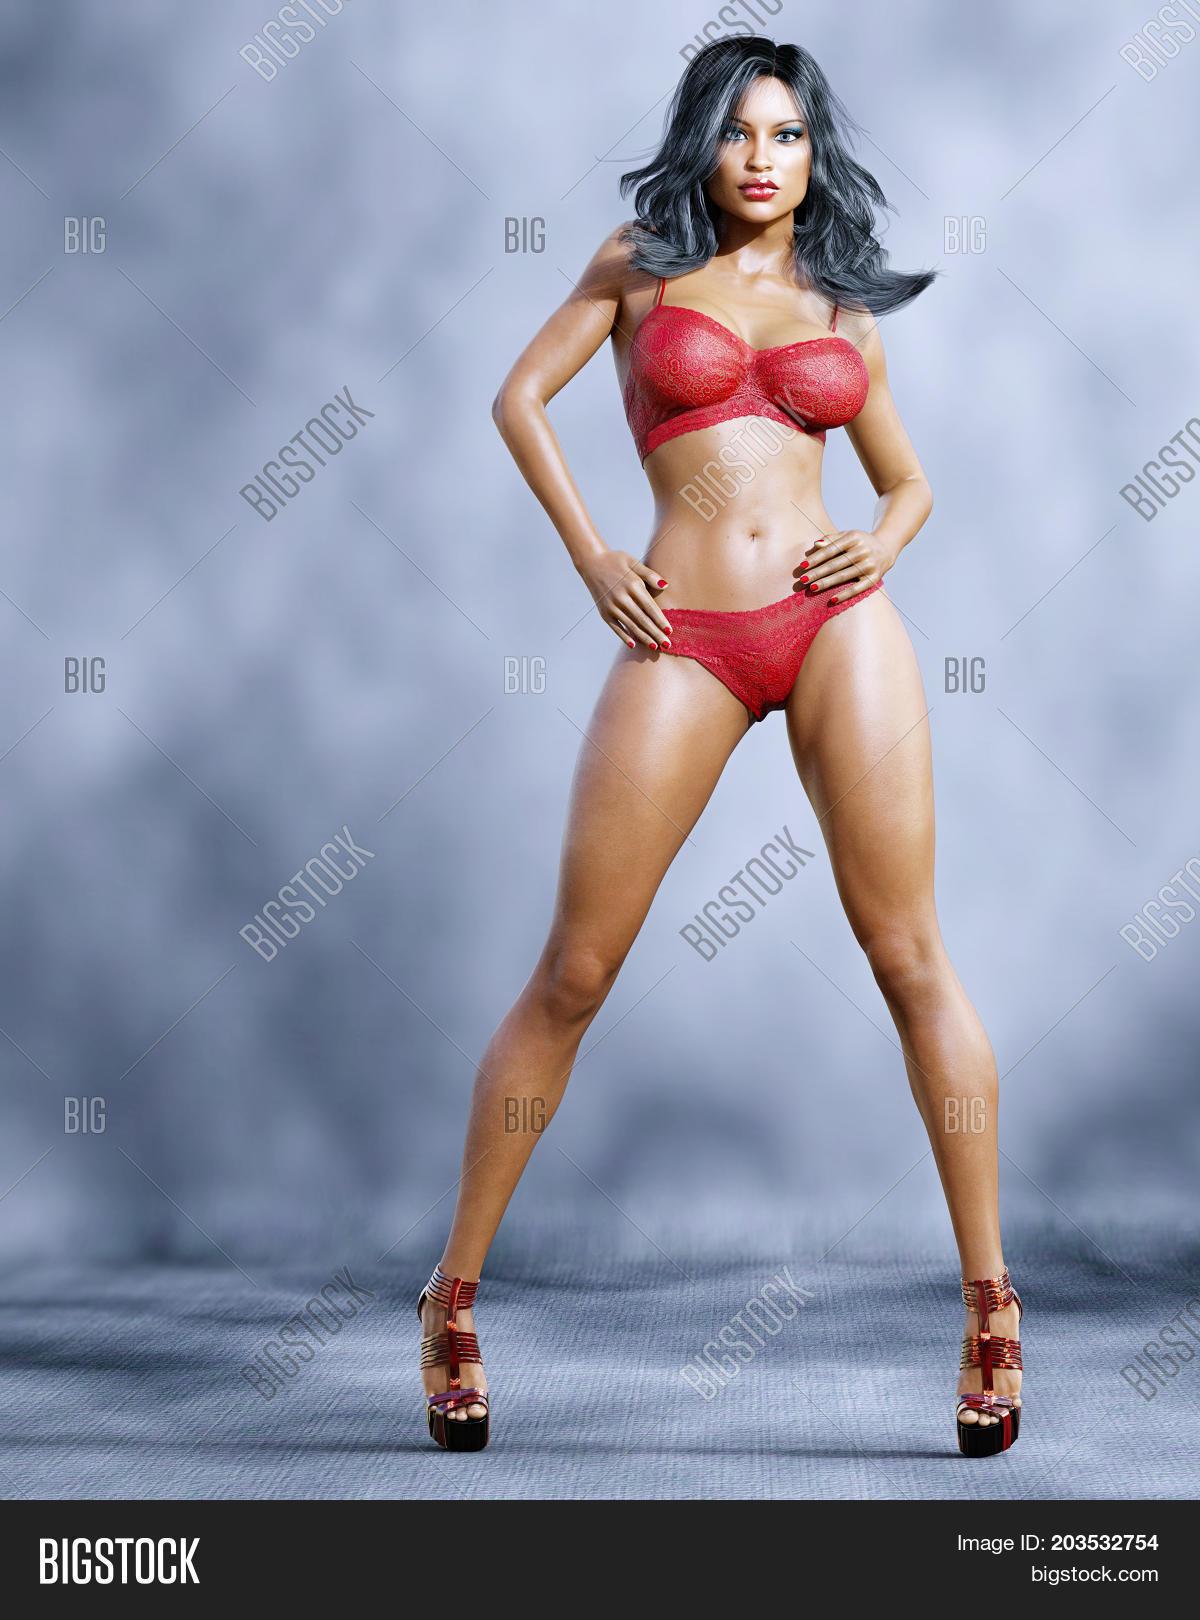 3e300dd2f6da7 Tall sexy woman in lingerie. Bra and panties. Conceptual fashion art. Blue  eyes